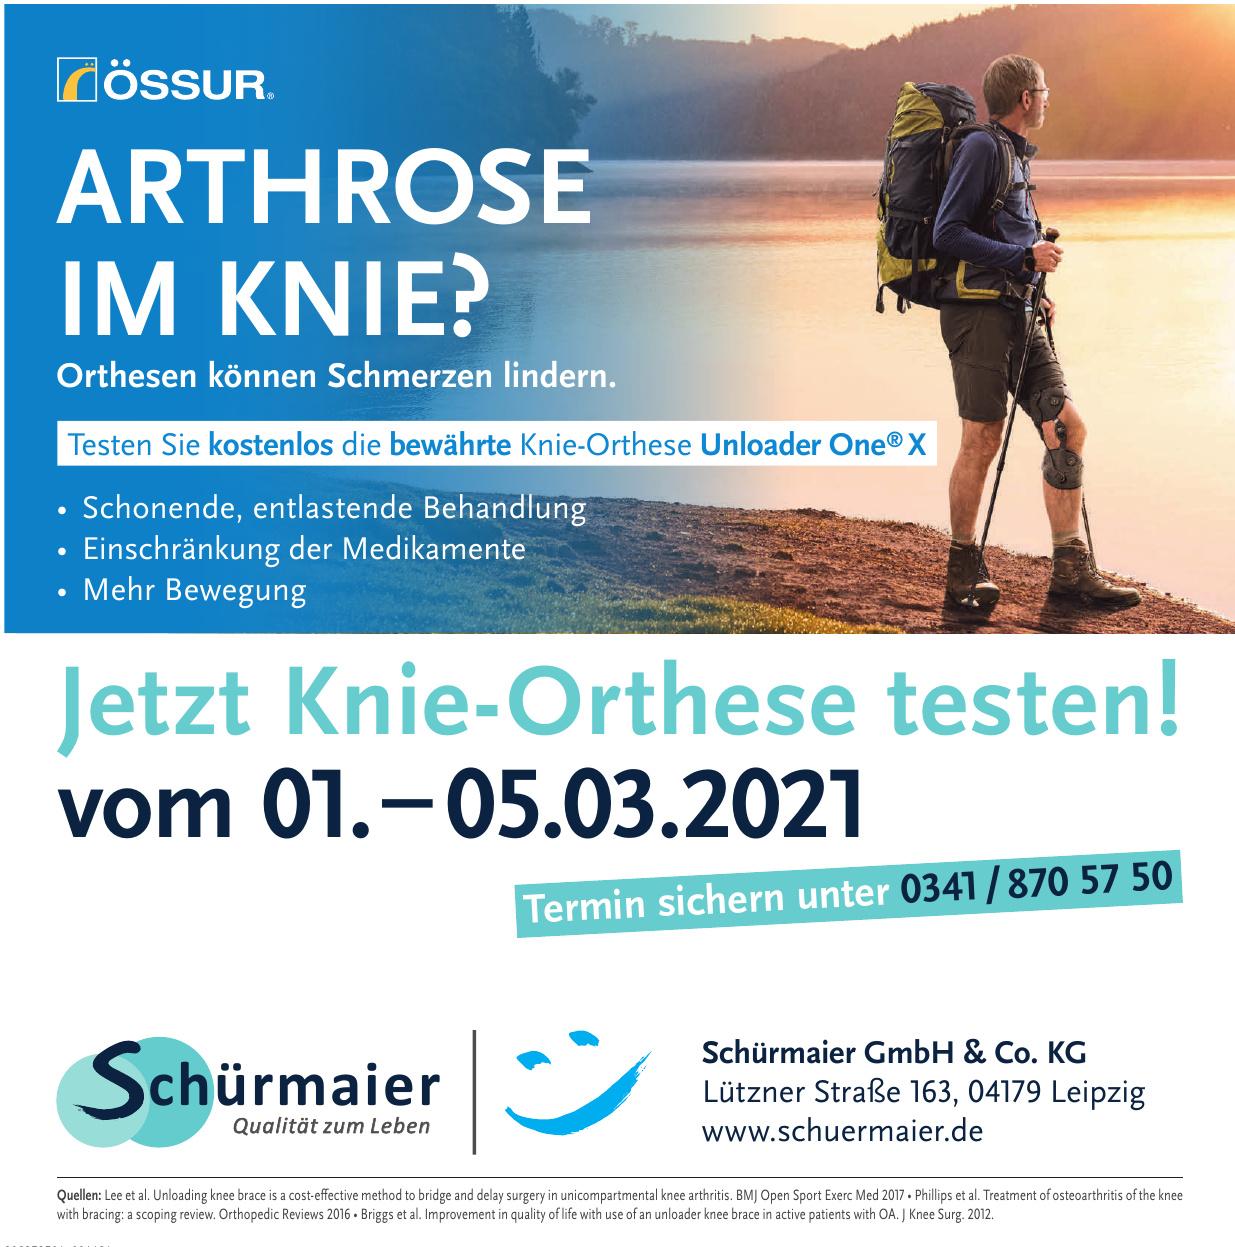 Schürmaier GmbH & Co. KG